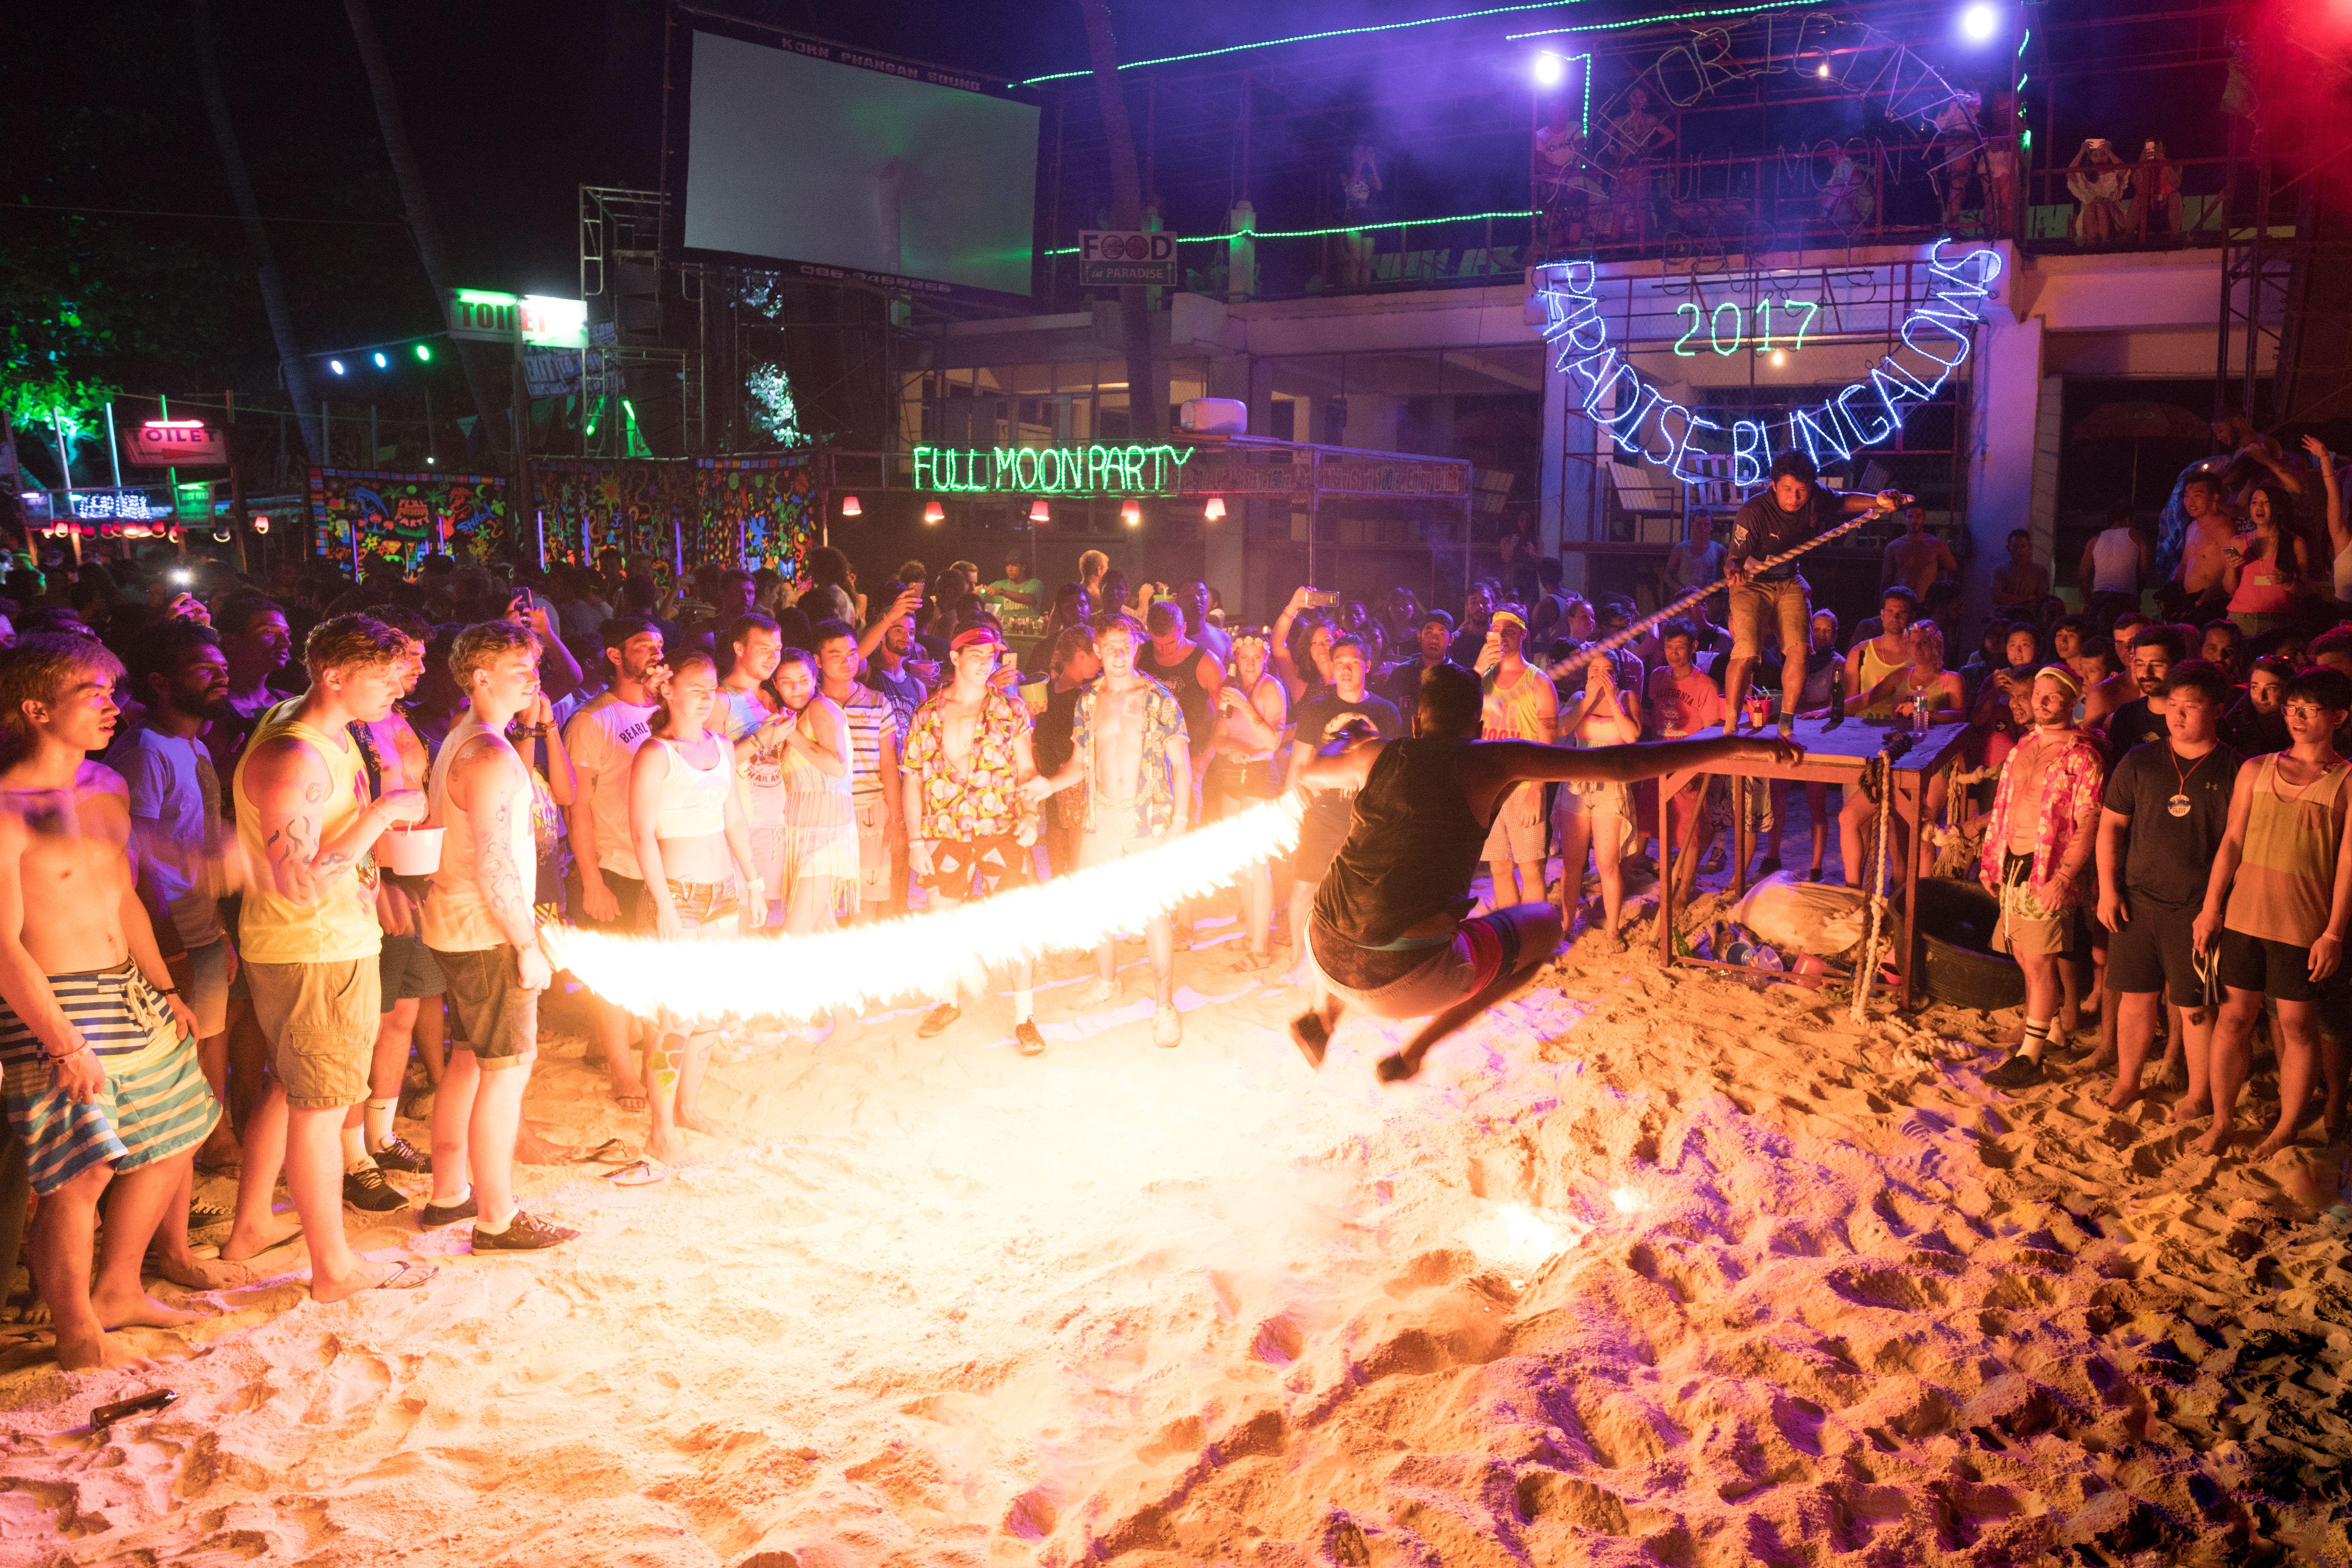 Koh Phangan Full Moon Party Survival Guide